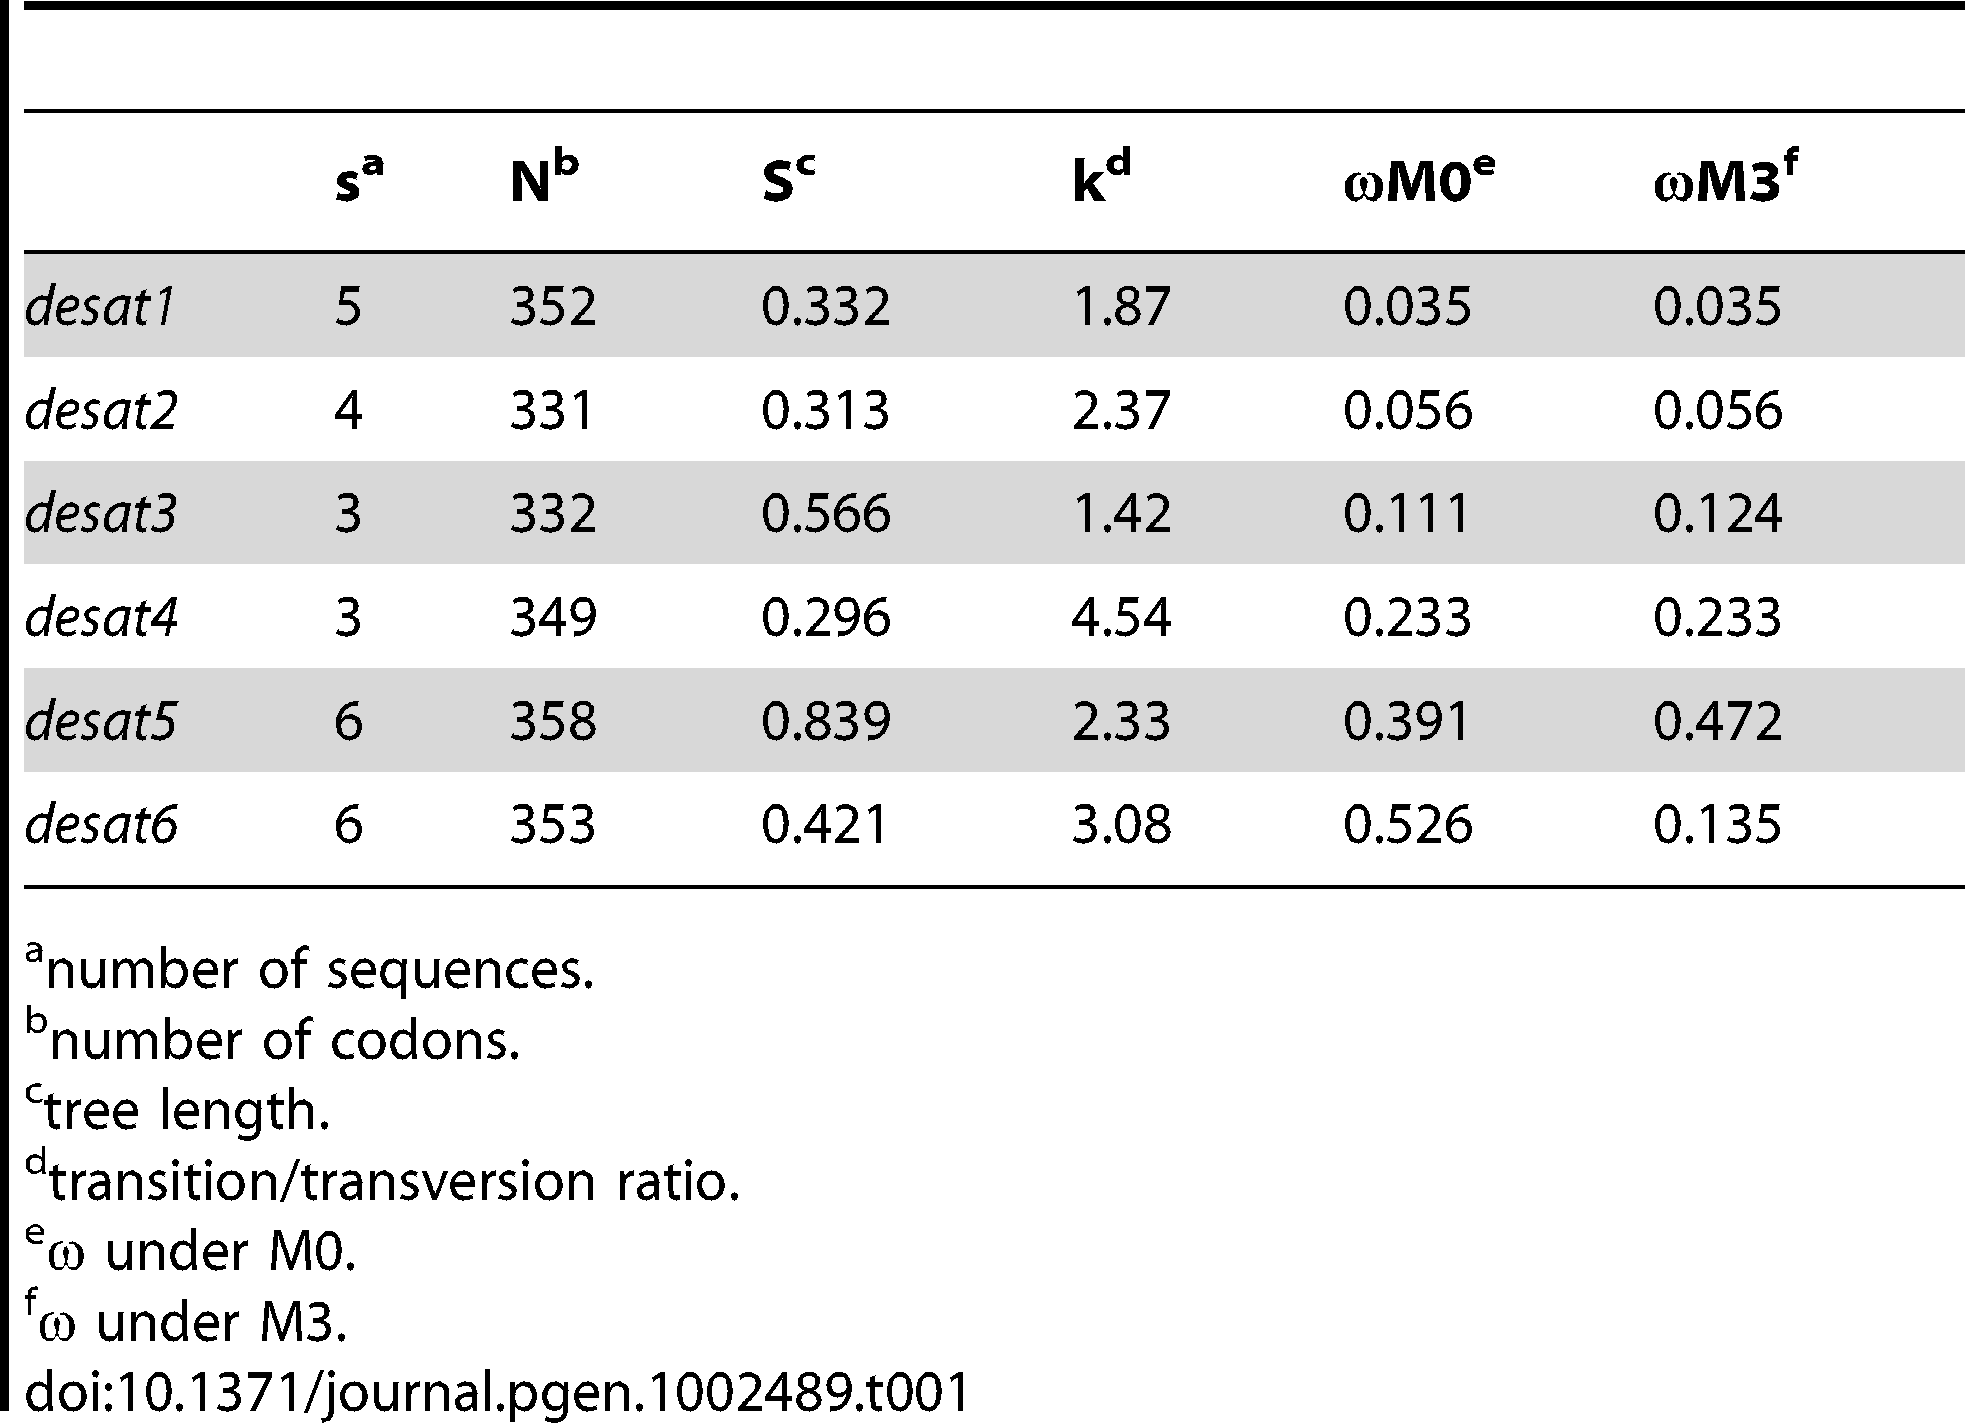 Summary statistics for desaturases from <i>Ctenopseustis</i> and <i>Planotortrix</i> species.